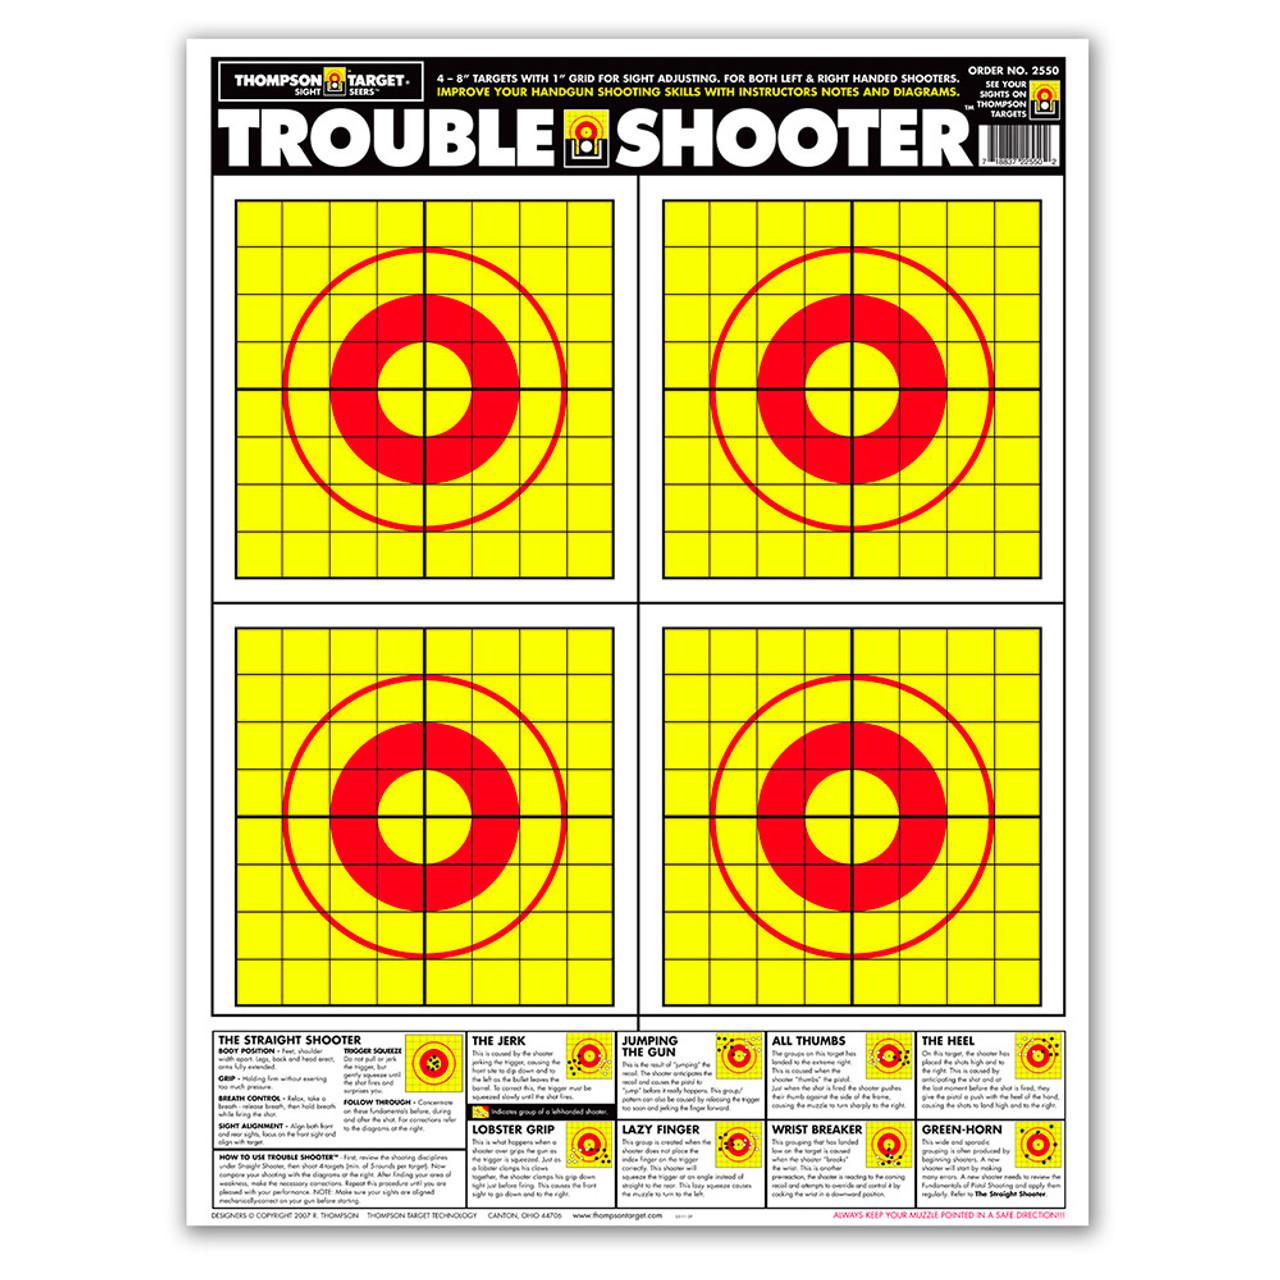 image about Printable Pistol Correction Chart identify Handgun capturing remaining